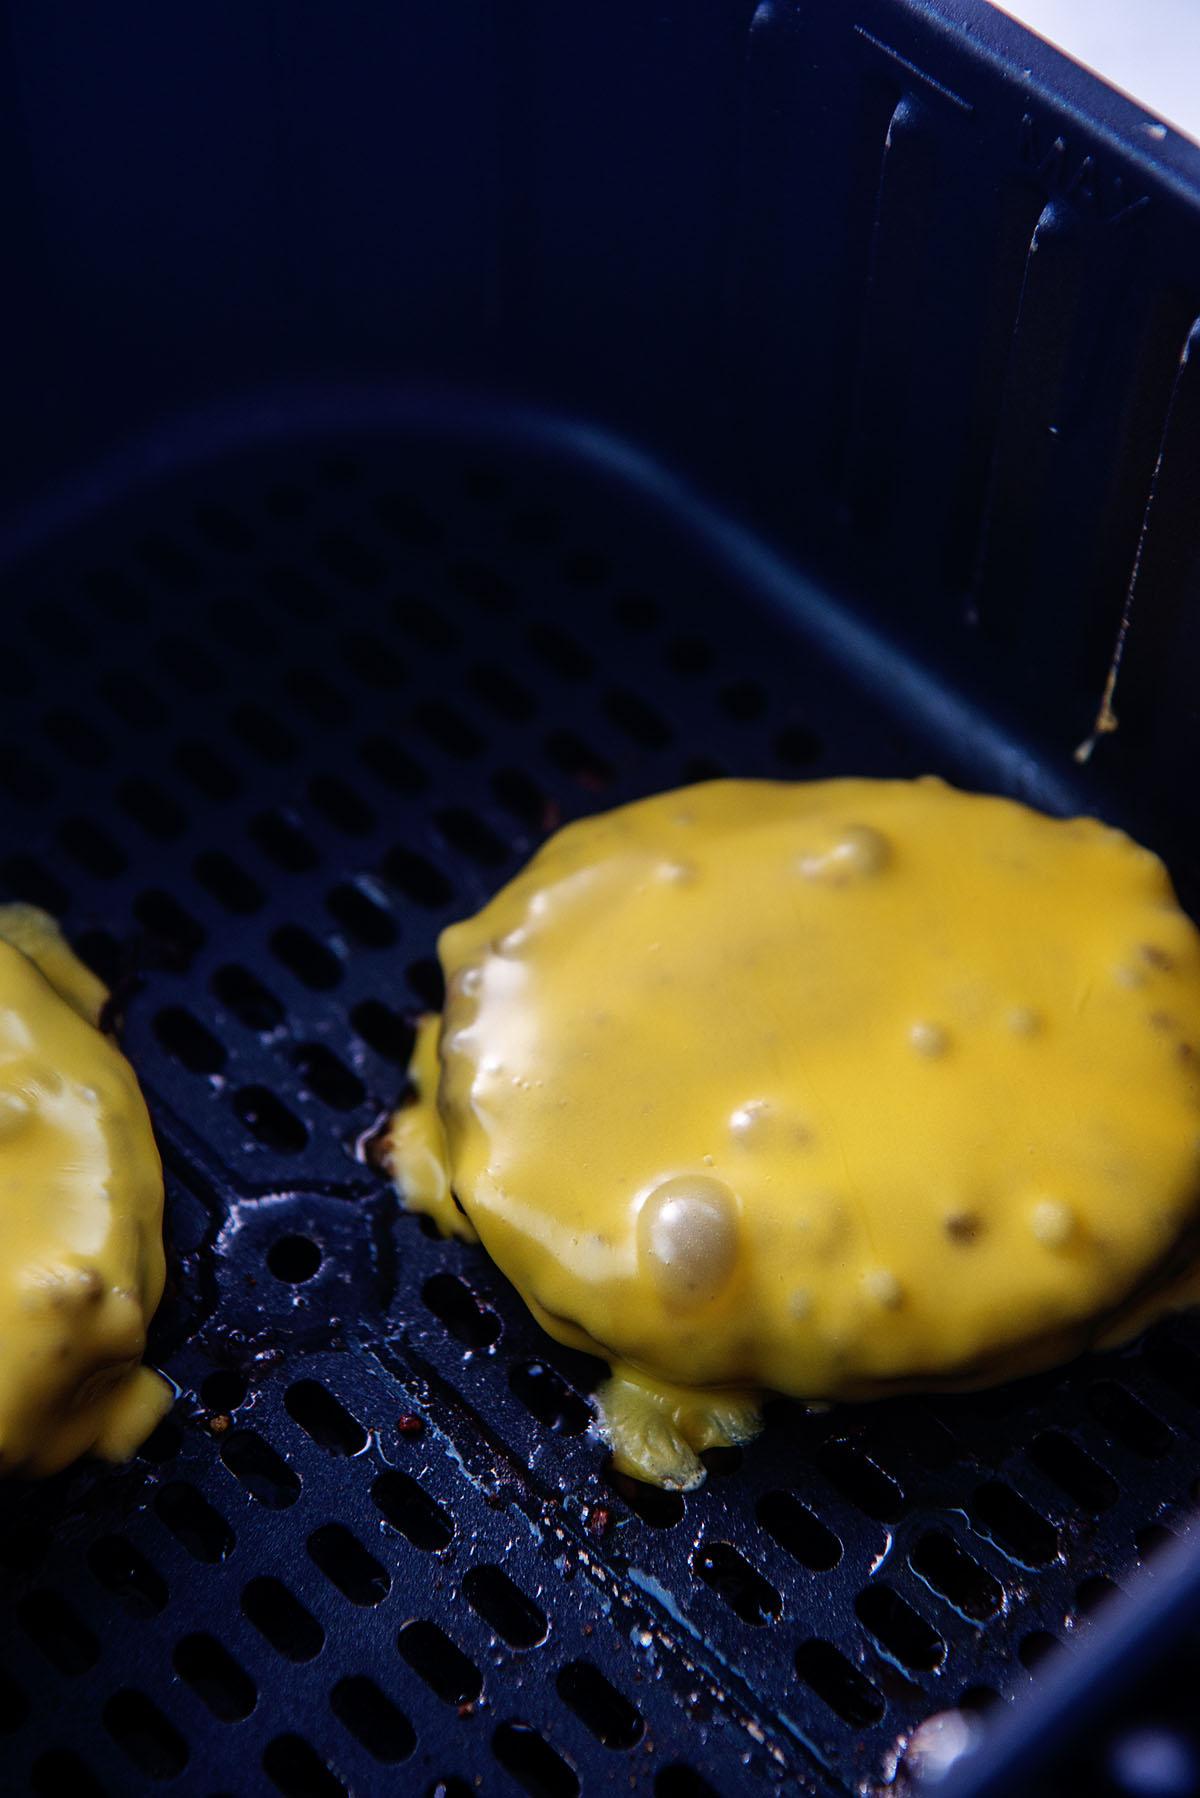 Two cheeseburgers in an air fryer basket.